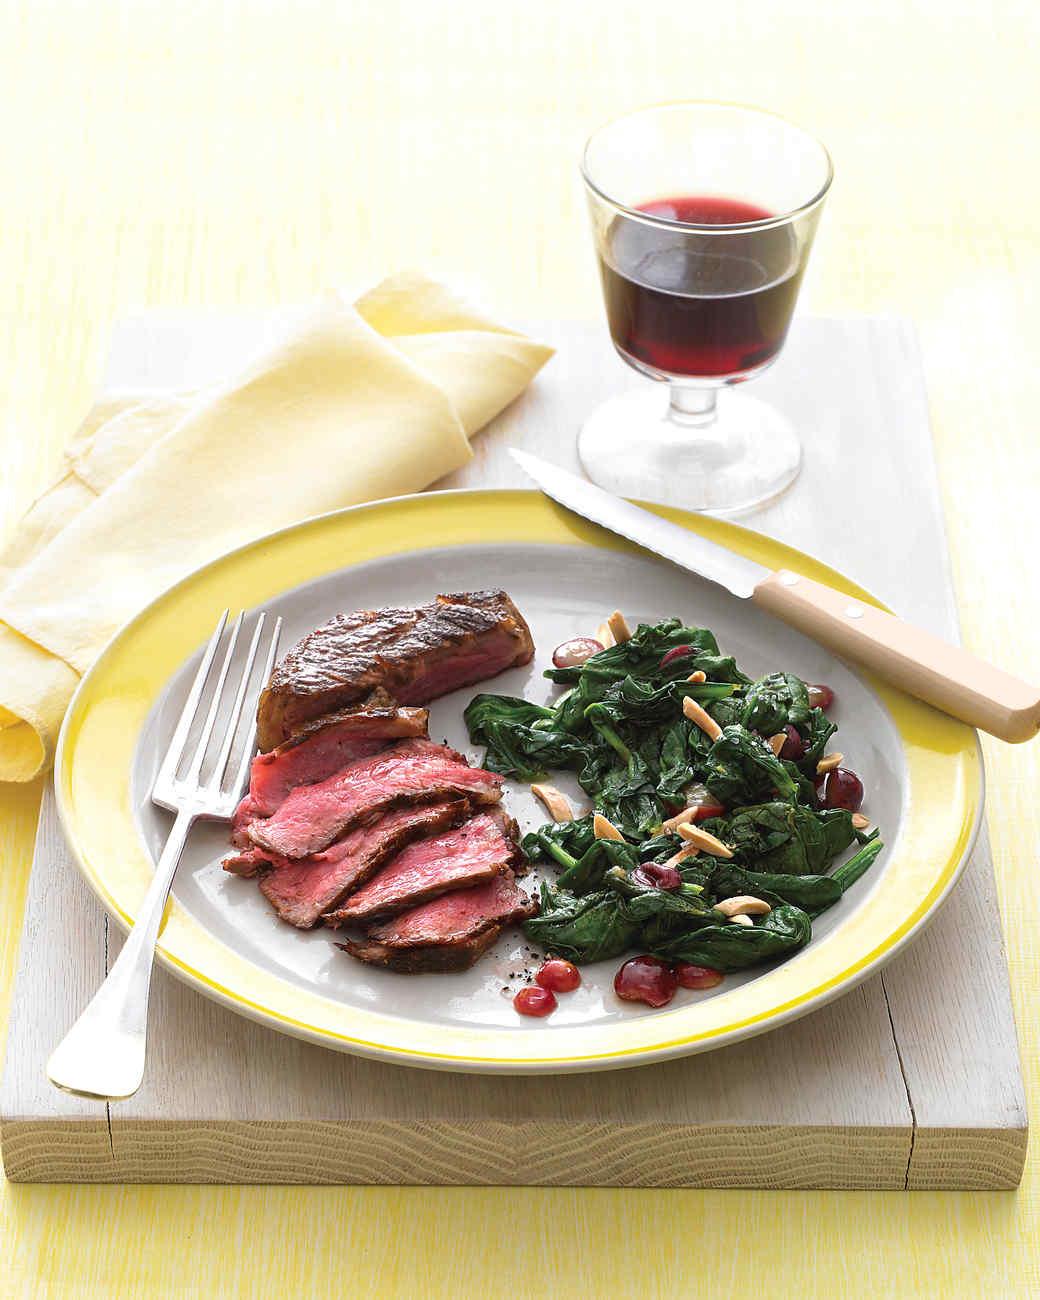 med103841_0608_steak_spinch.jpg